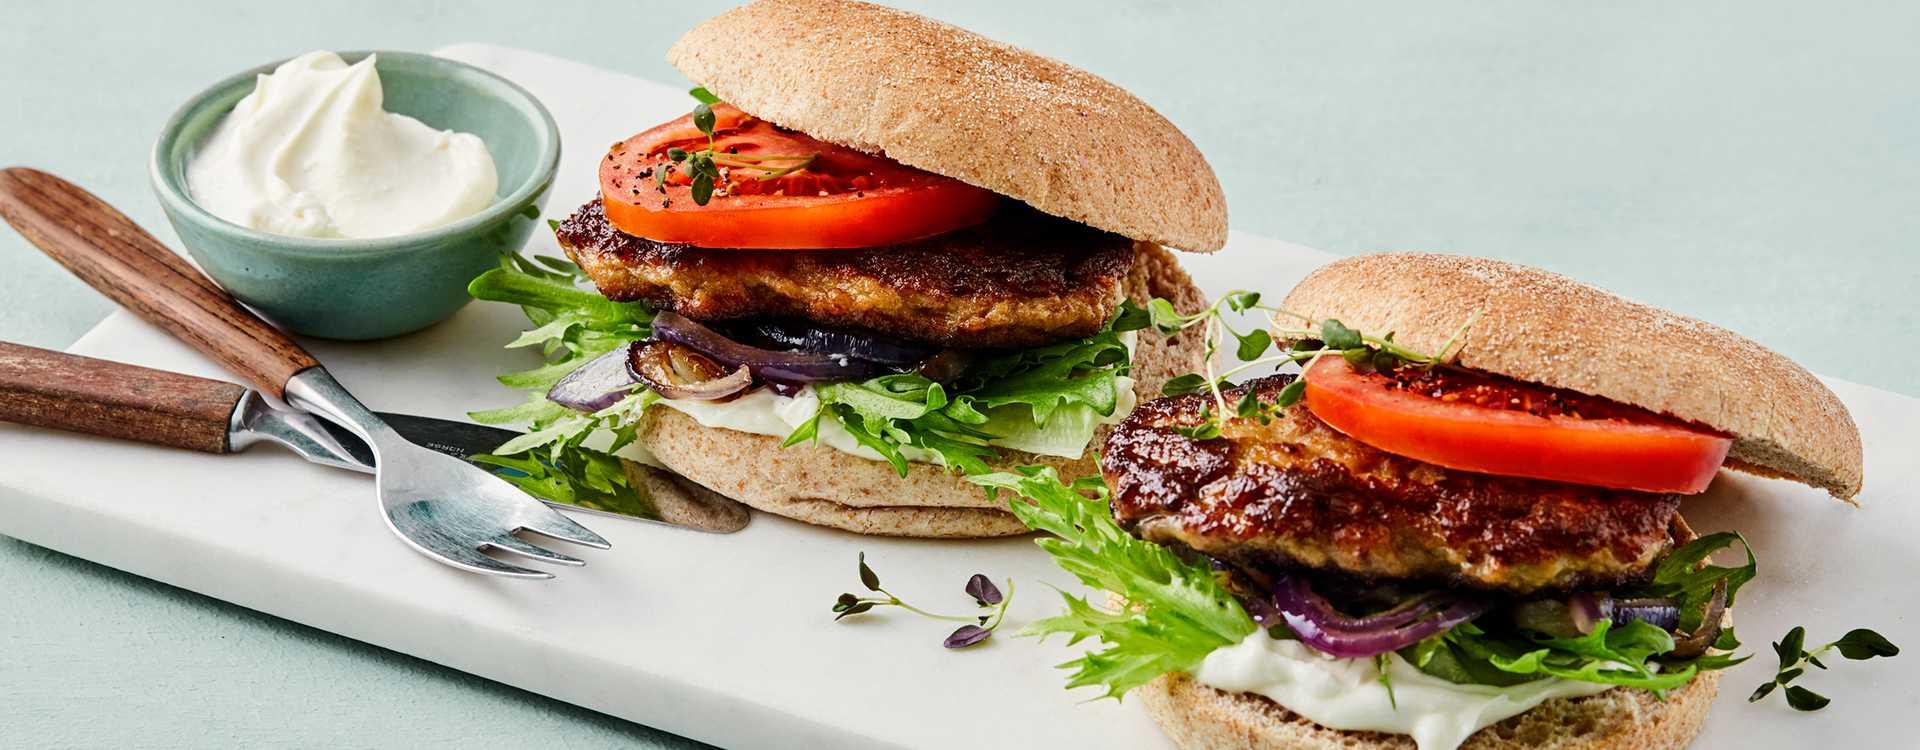 Karbonader med crispy salat og stekt rødløk i grove hamburgerbrød